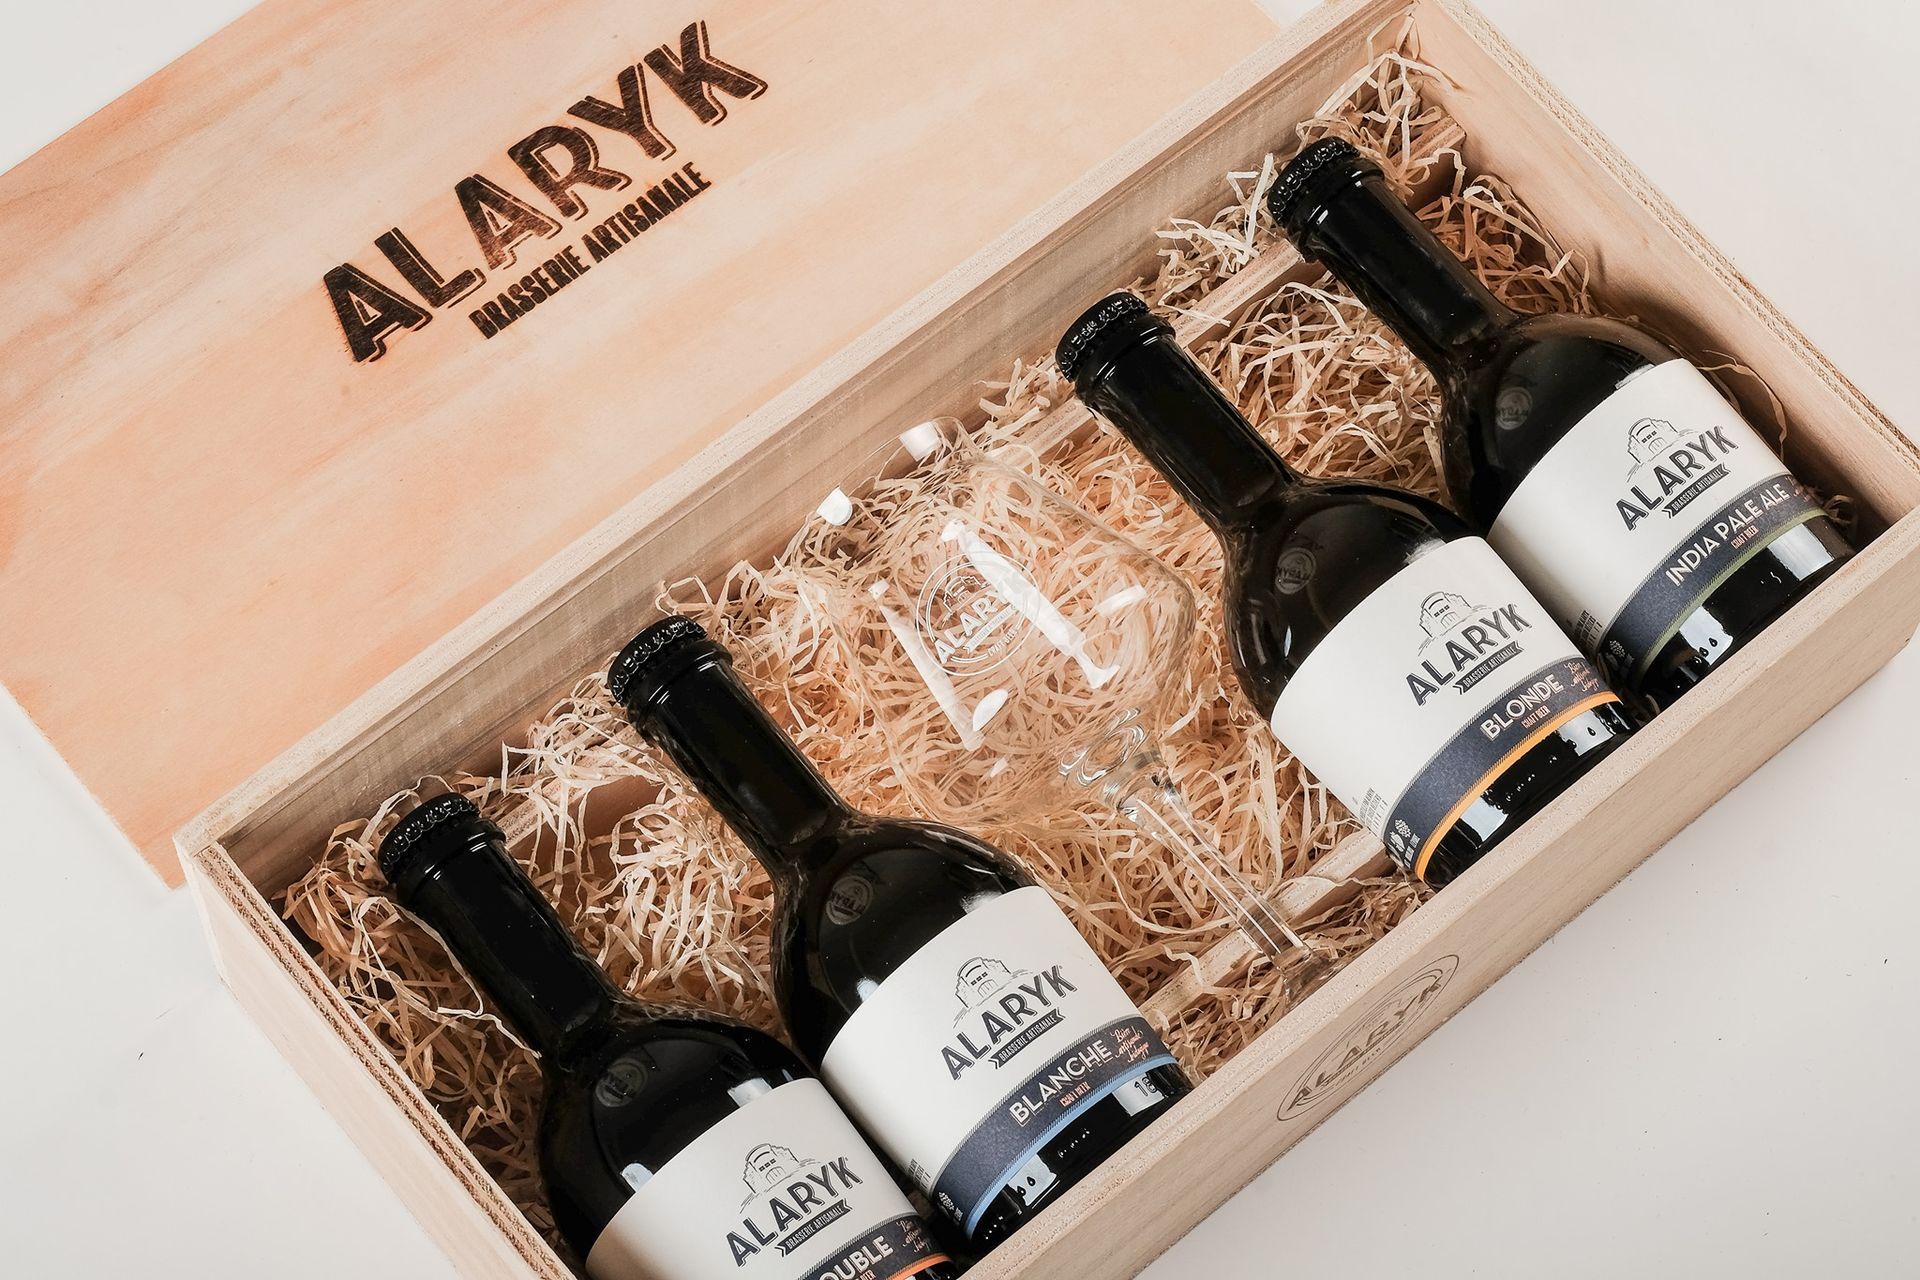 Coffret de bières artisanales - Brasserie Alarik